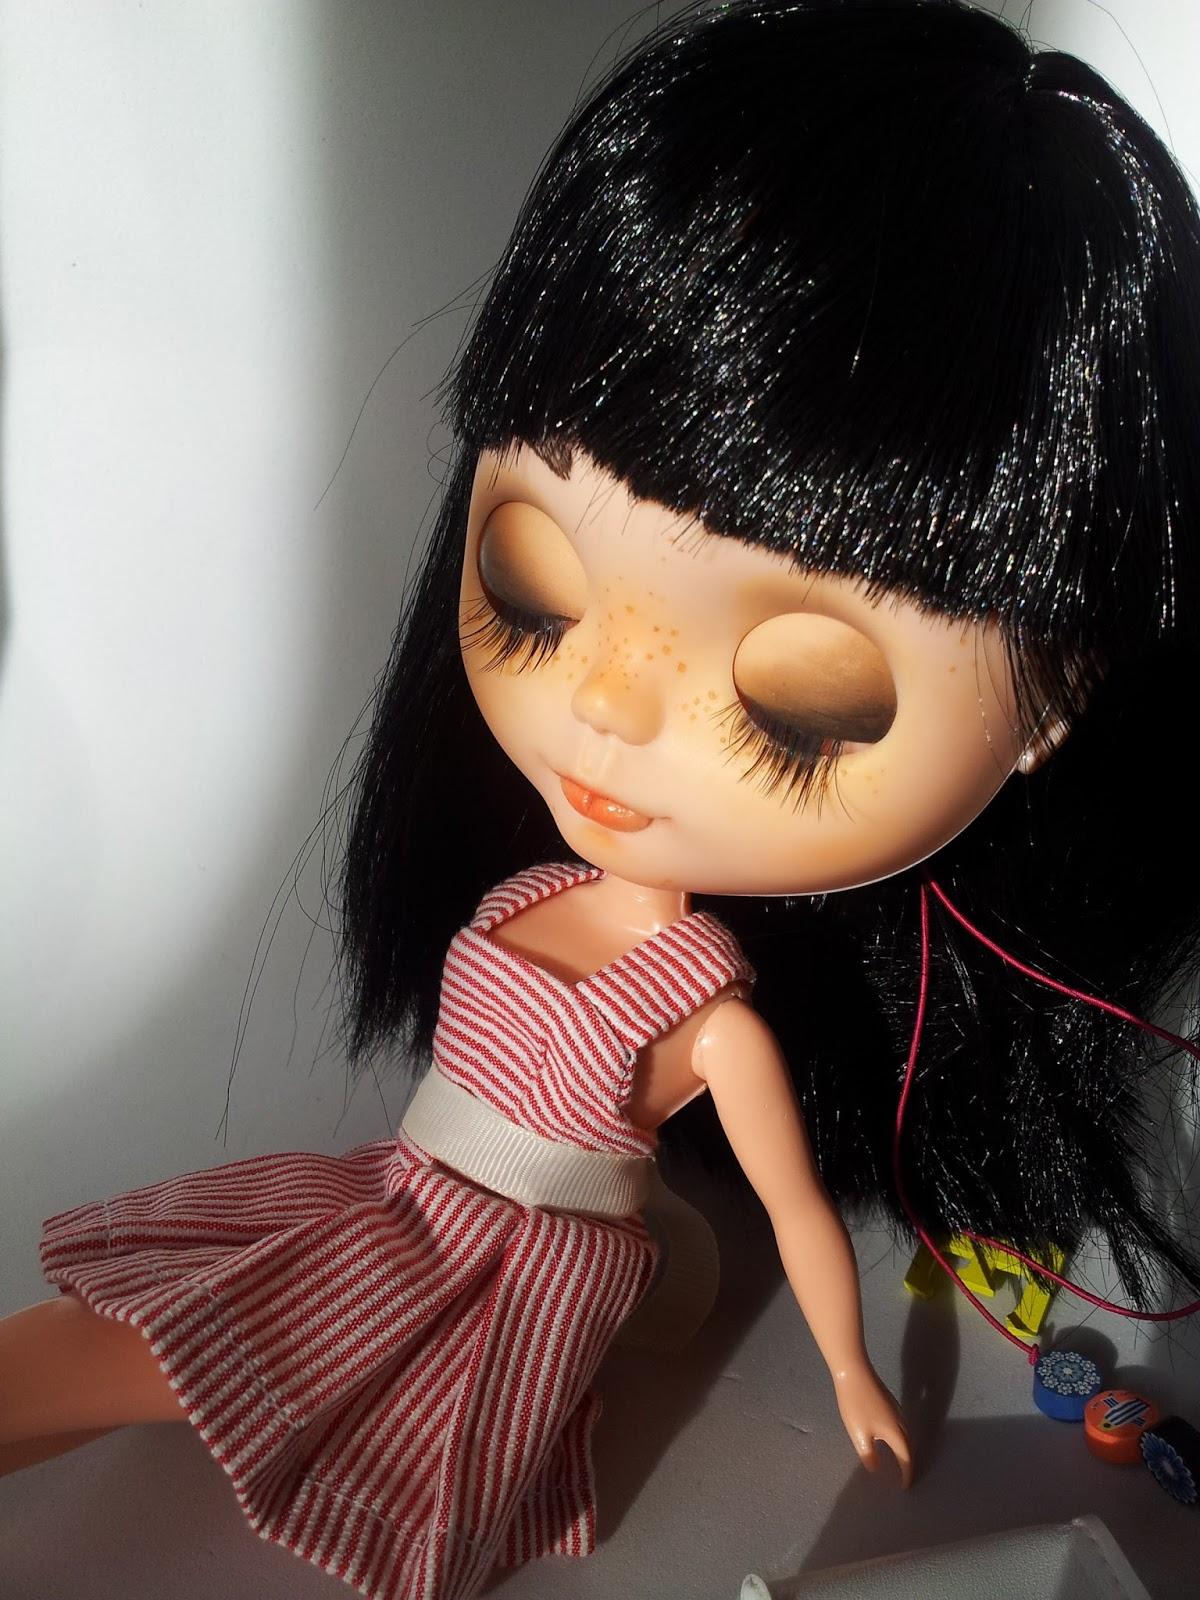 muñeca customizada a mano por Dulce desepera